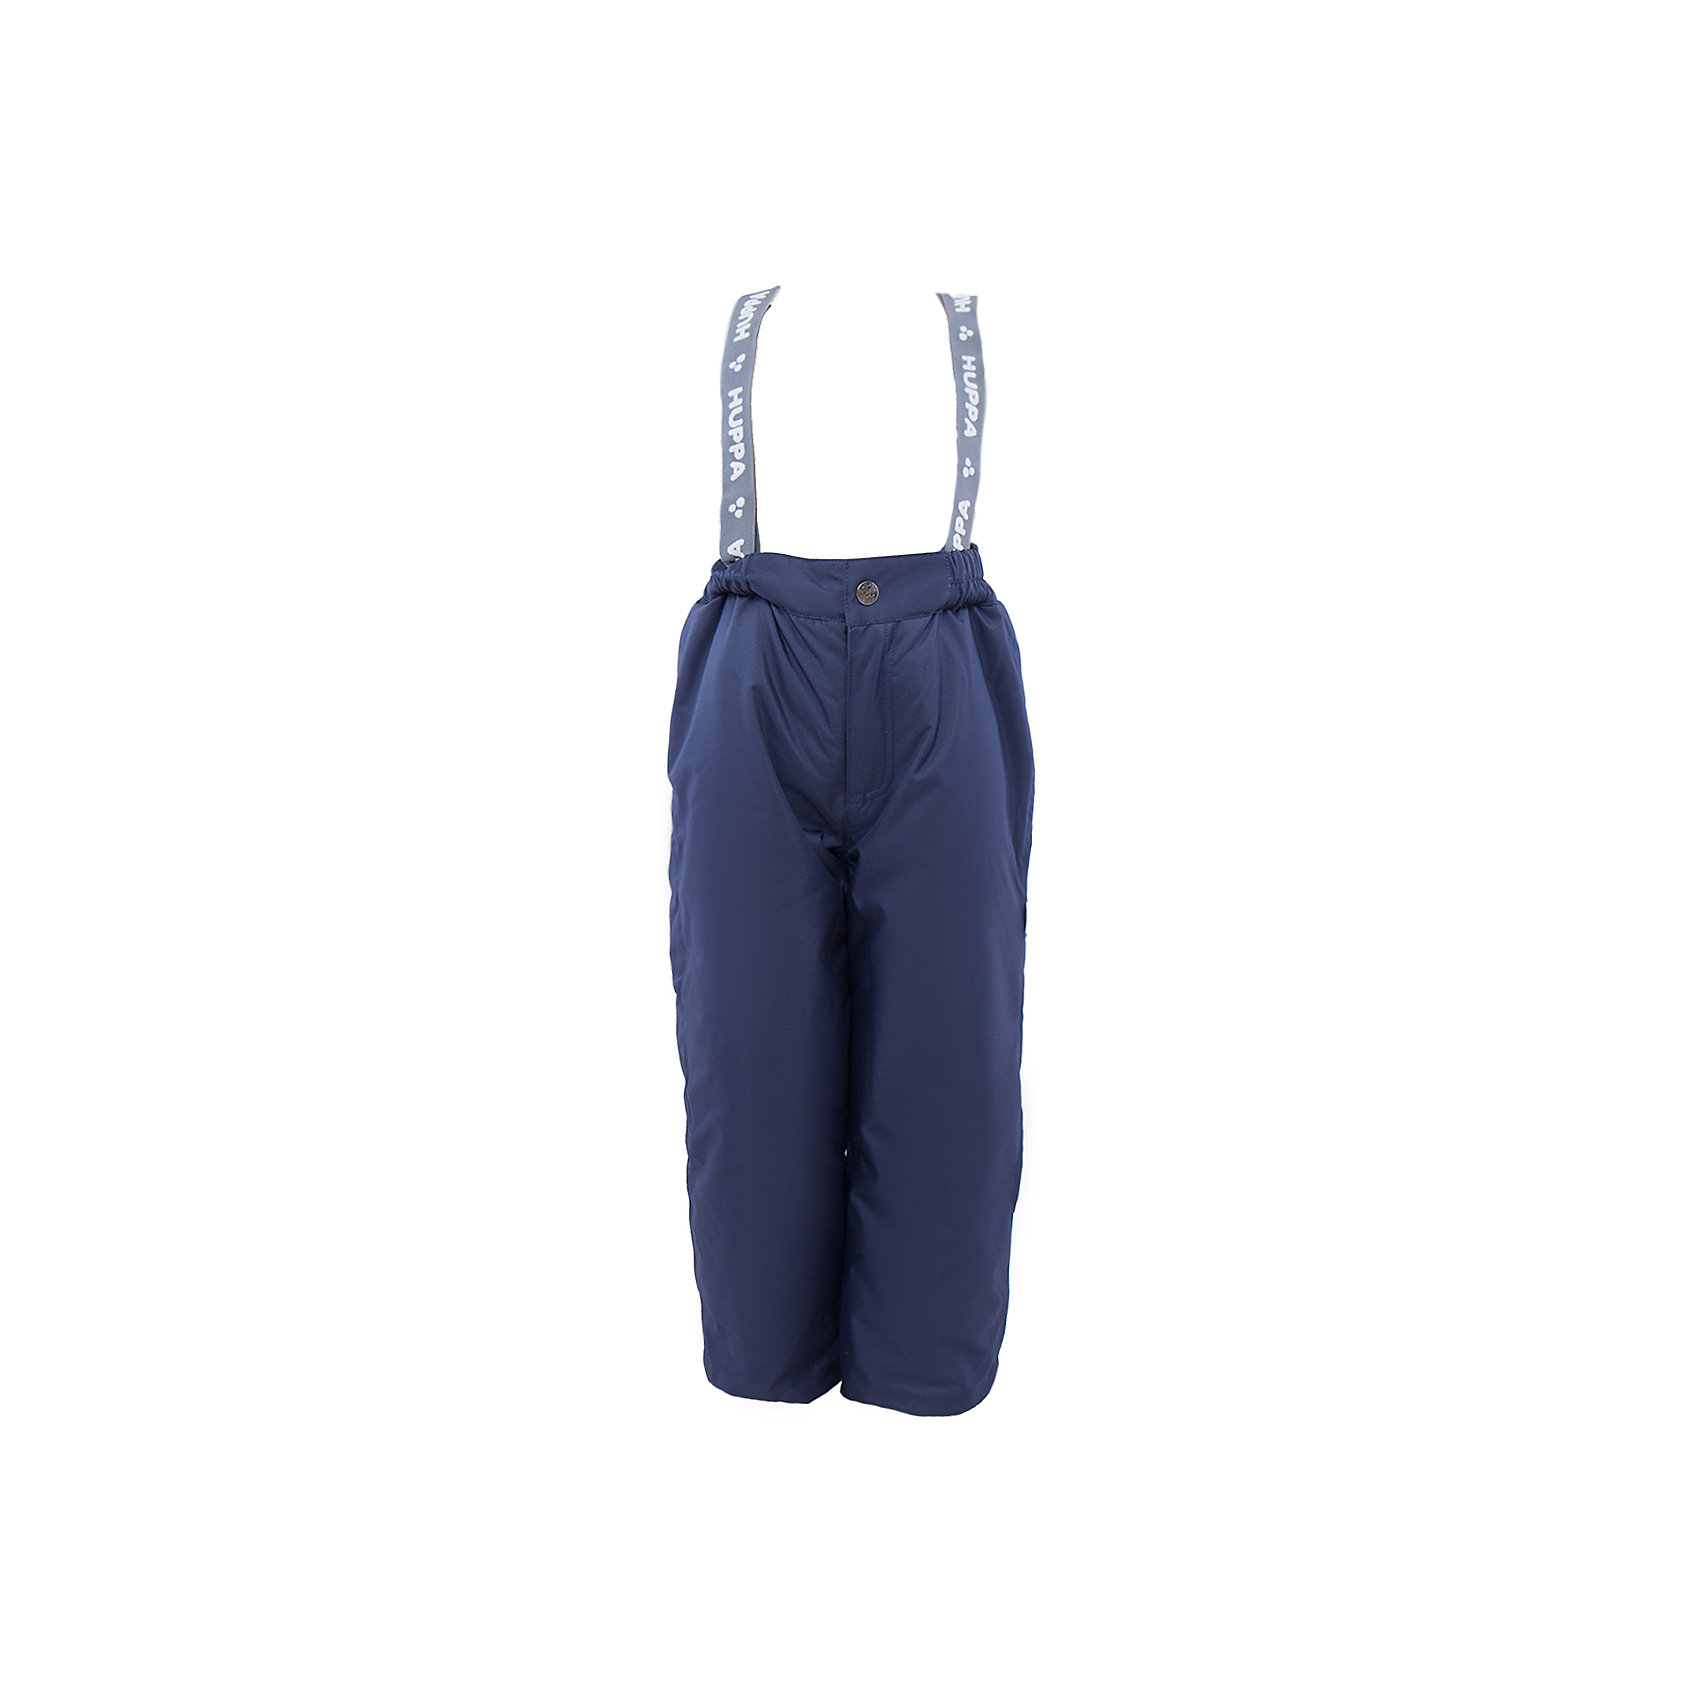 Huppa Брюки    Huppa брюки утепленные детские huppa freja 1 цвет темно лилoвый 21700116 70073 размер 164